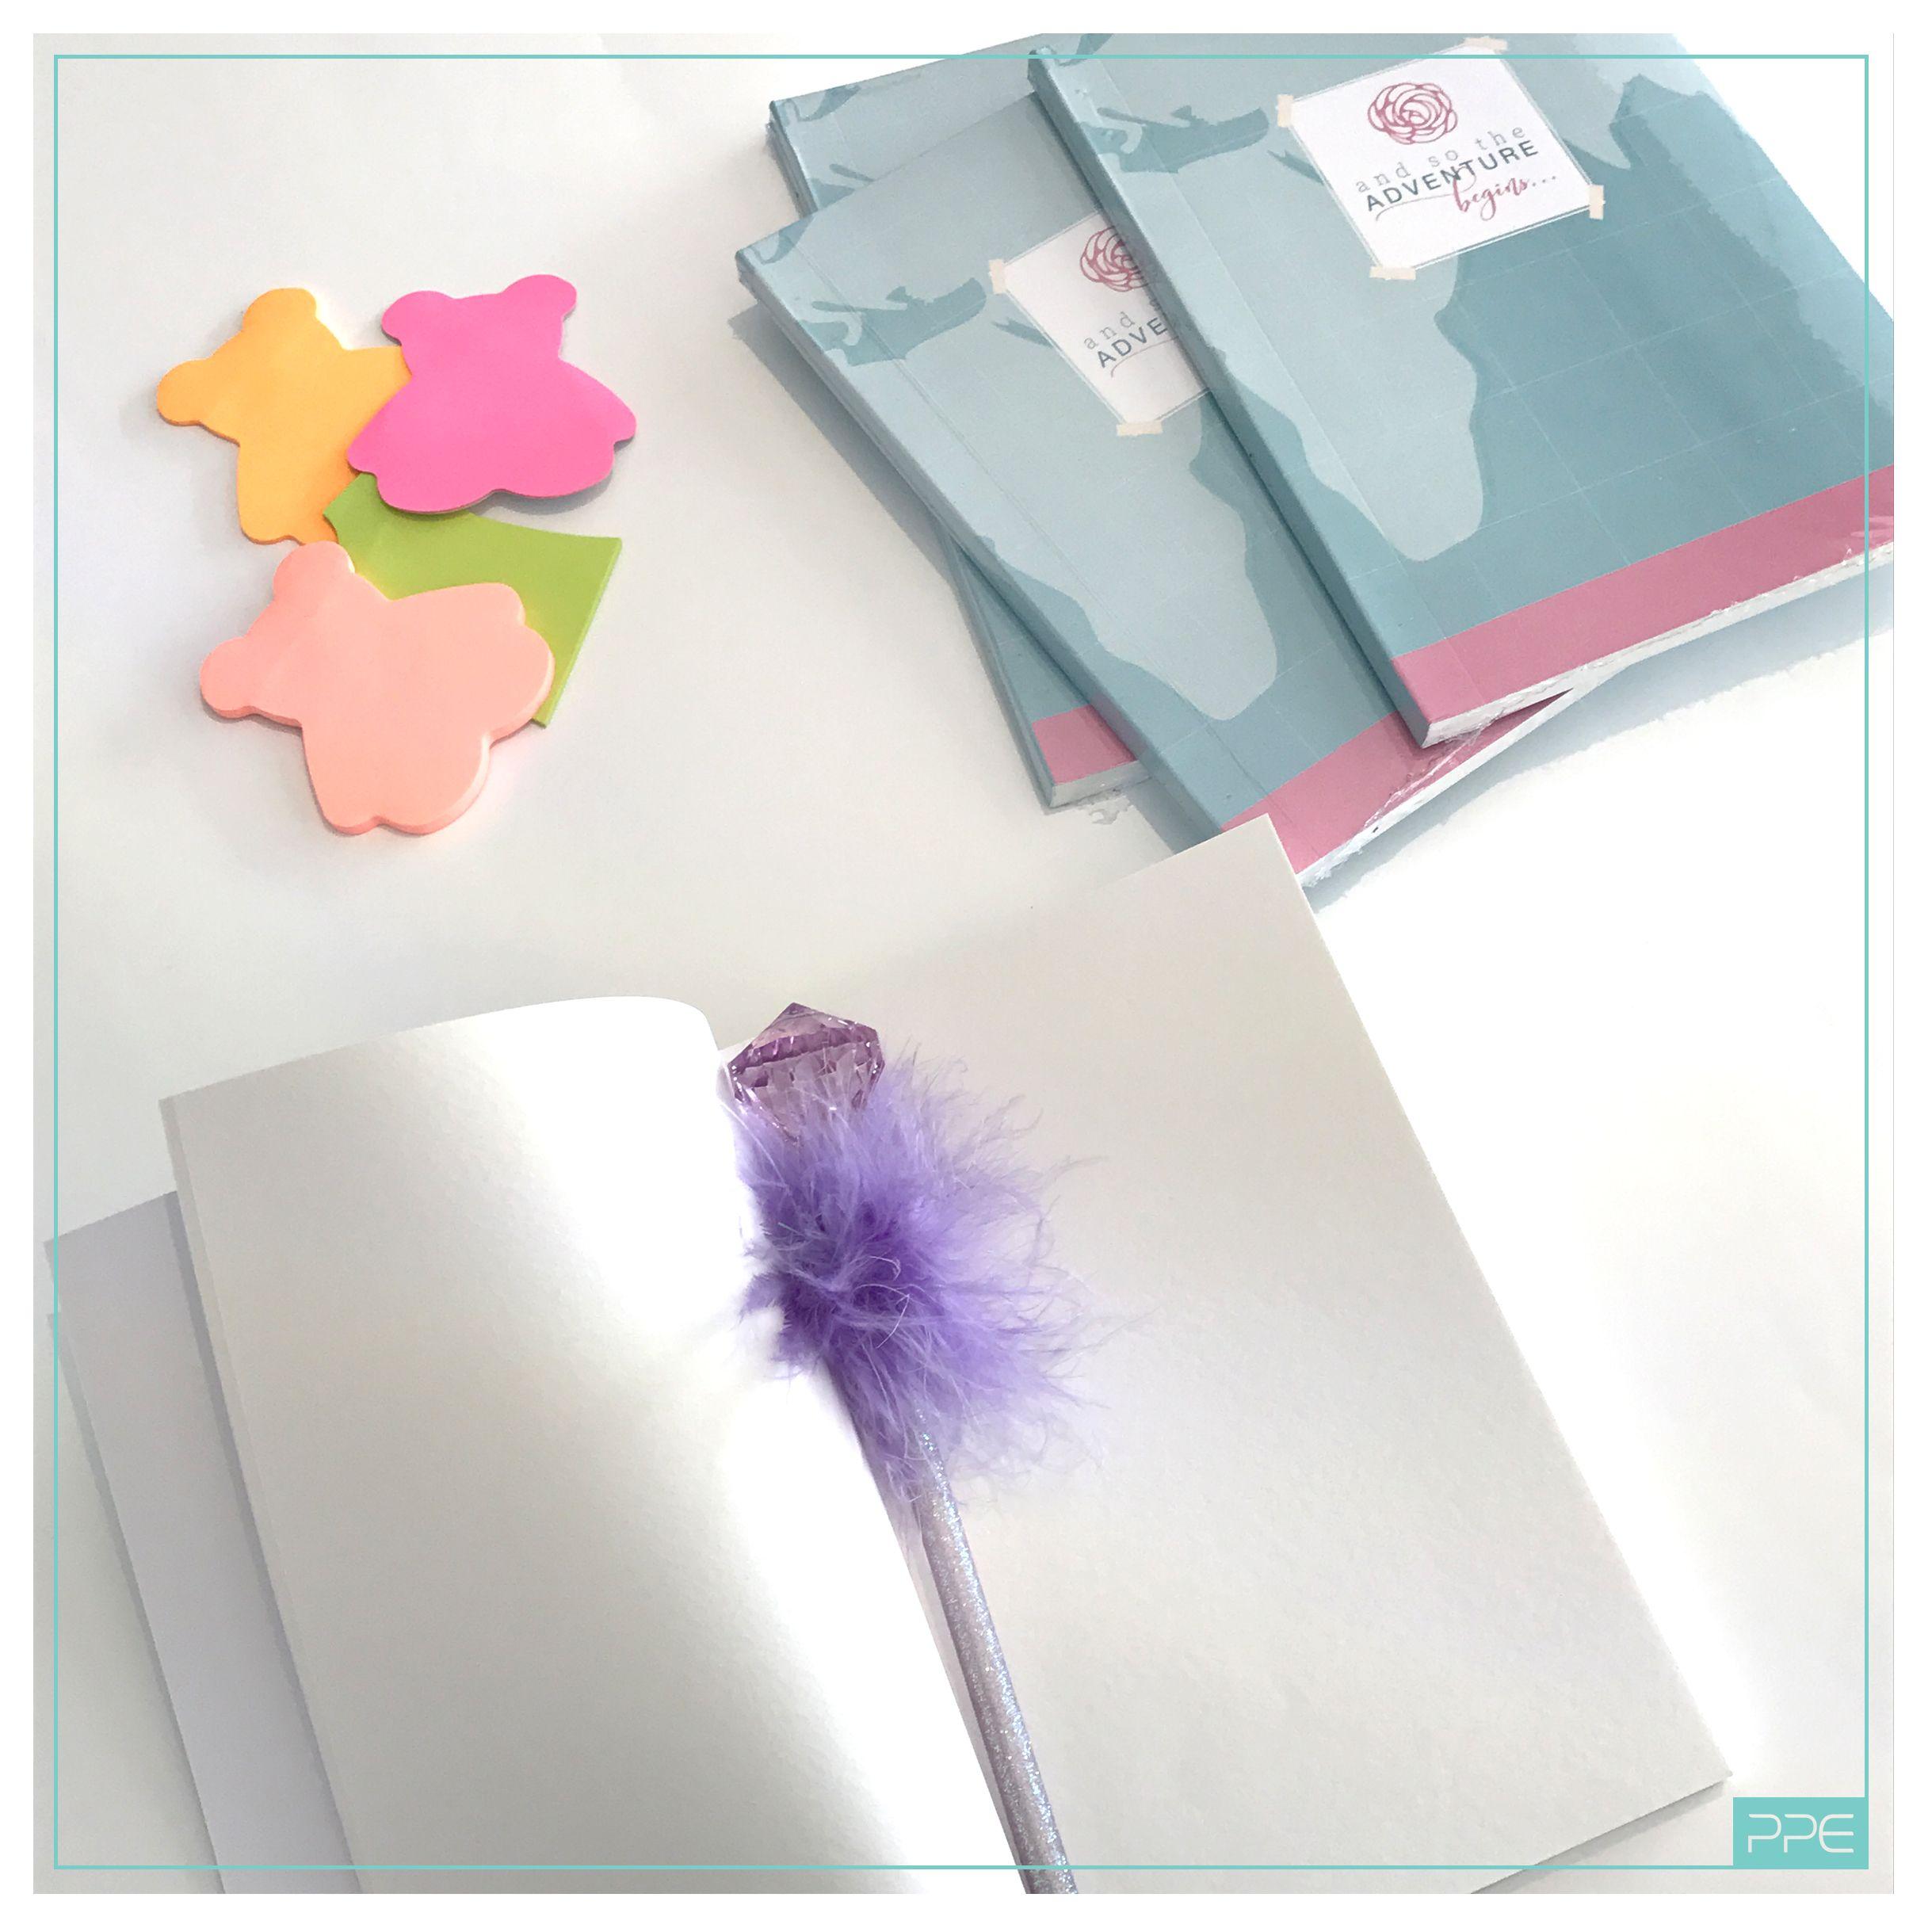 Pin By Plus Print L الطباعة الاضافية On اليد In 2021 Books Notes Notebook